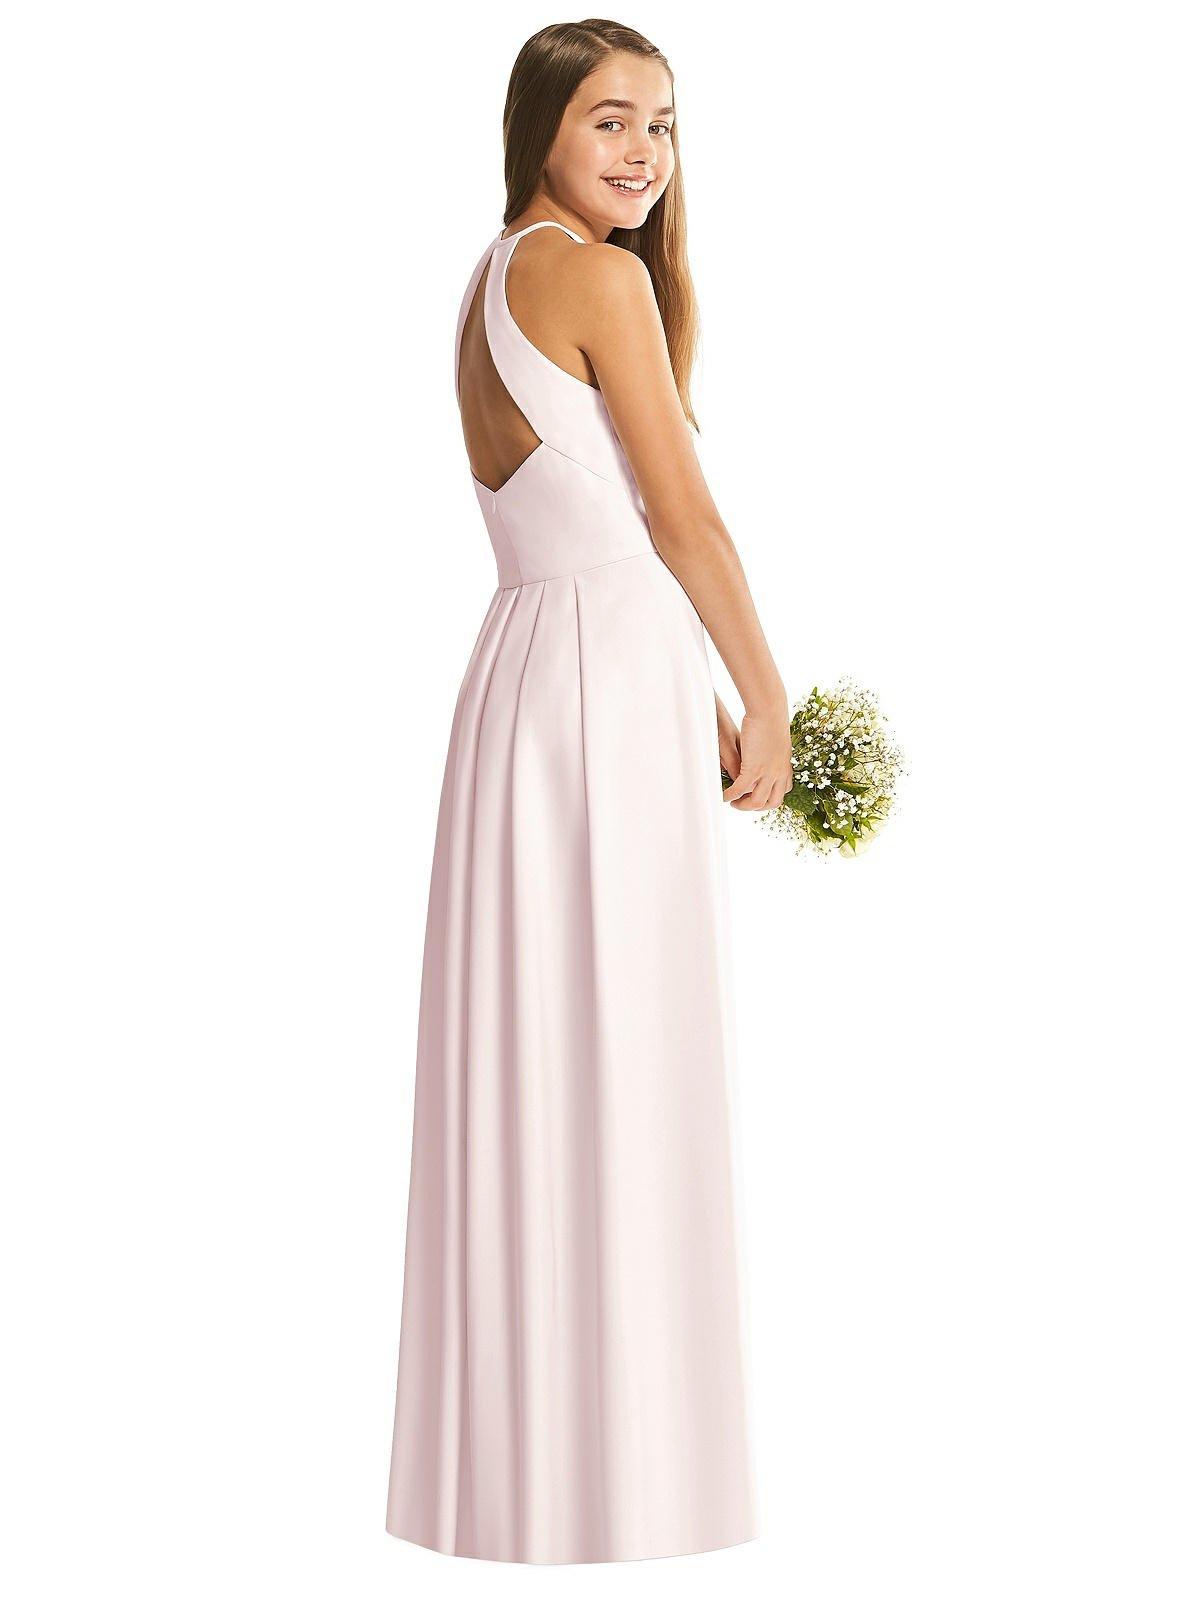 Blush Halter Crepe Junior Bridesmaids Dress